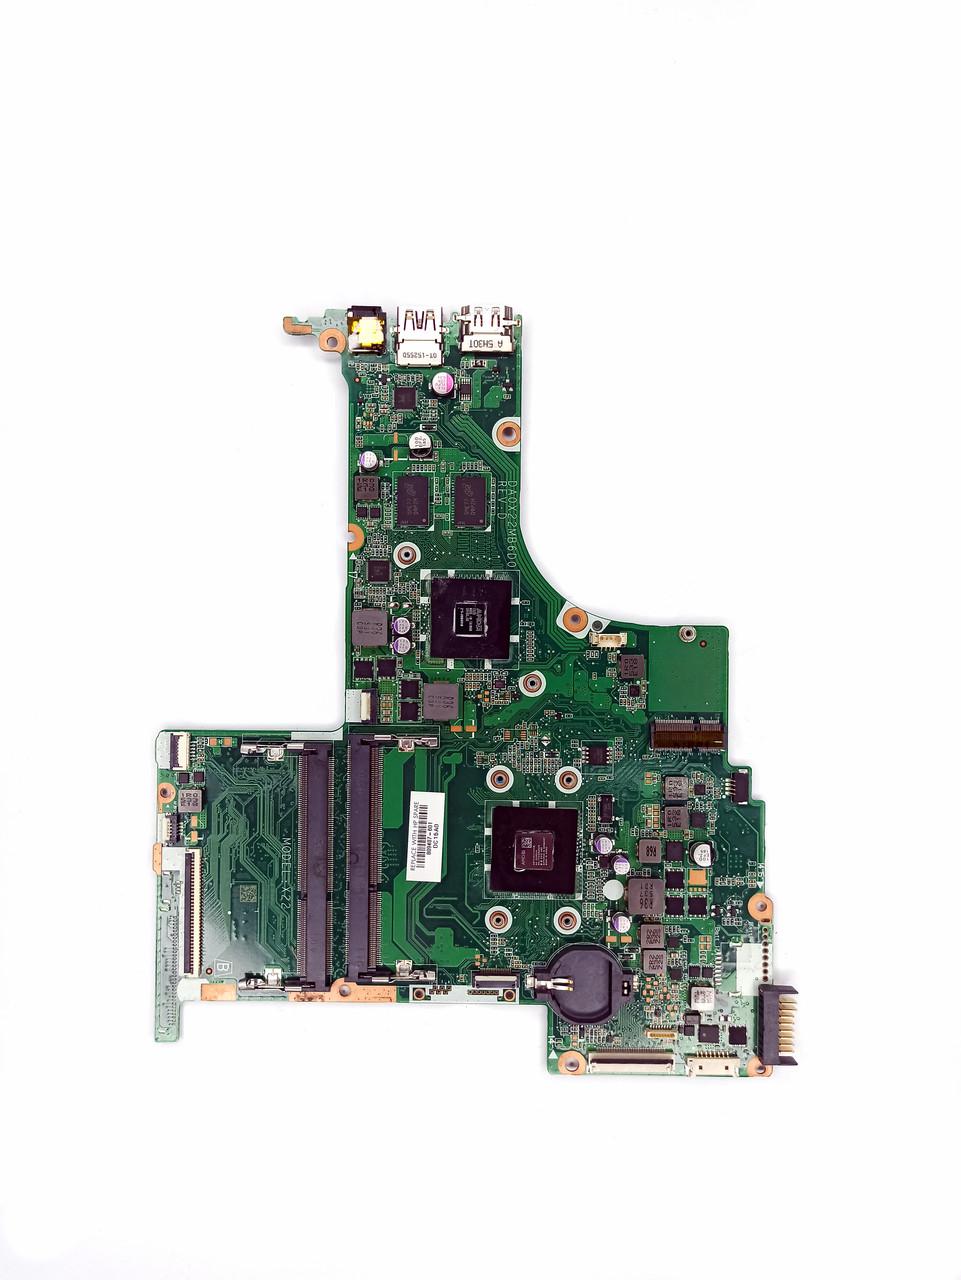 Материнская плата не рабочая на запчасти (DA0X22MB6D0) для ноутбука HP 15-ab125ur